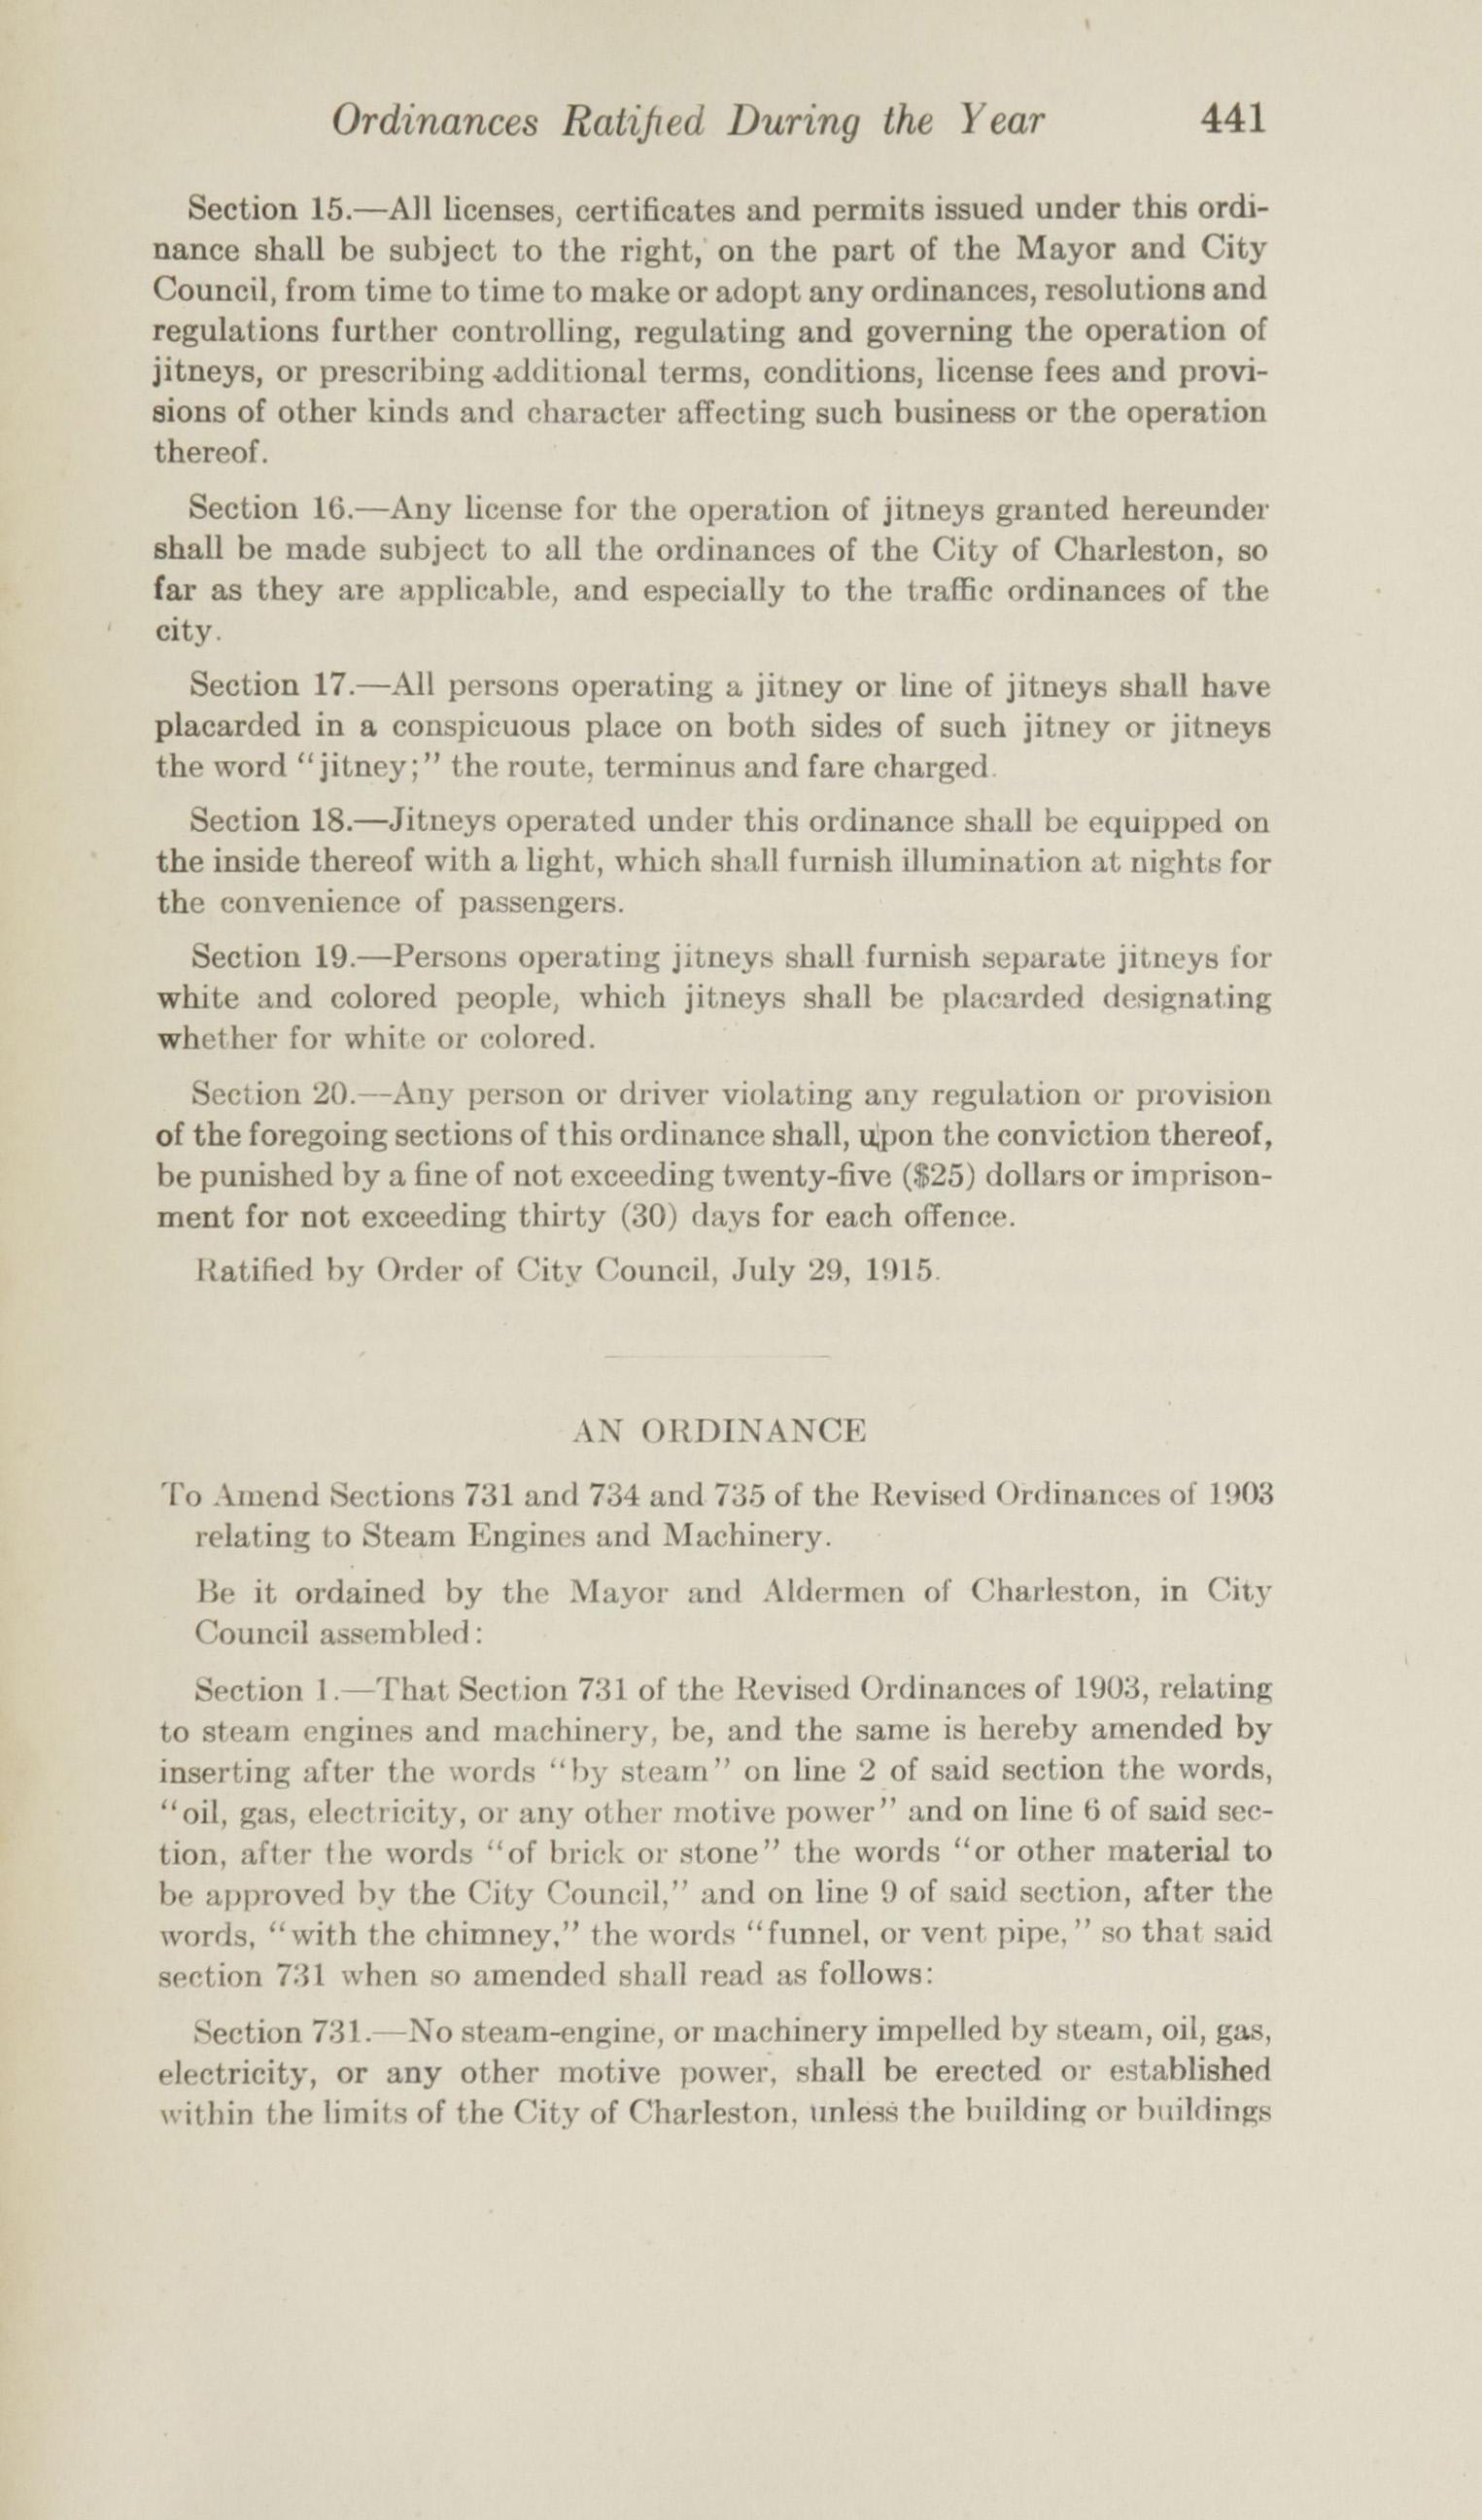 Charleston Yearbook, 1915, page 441